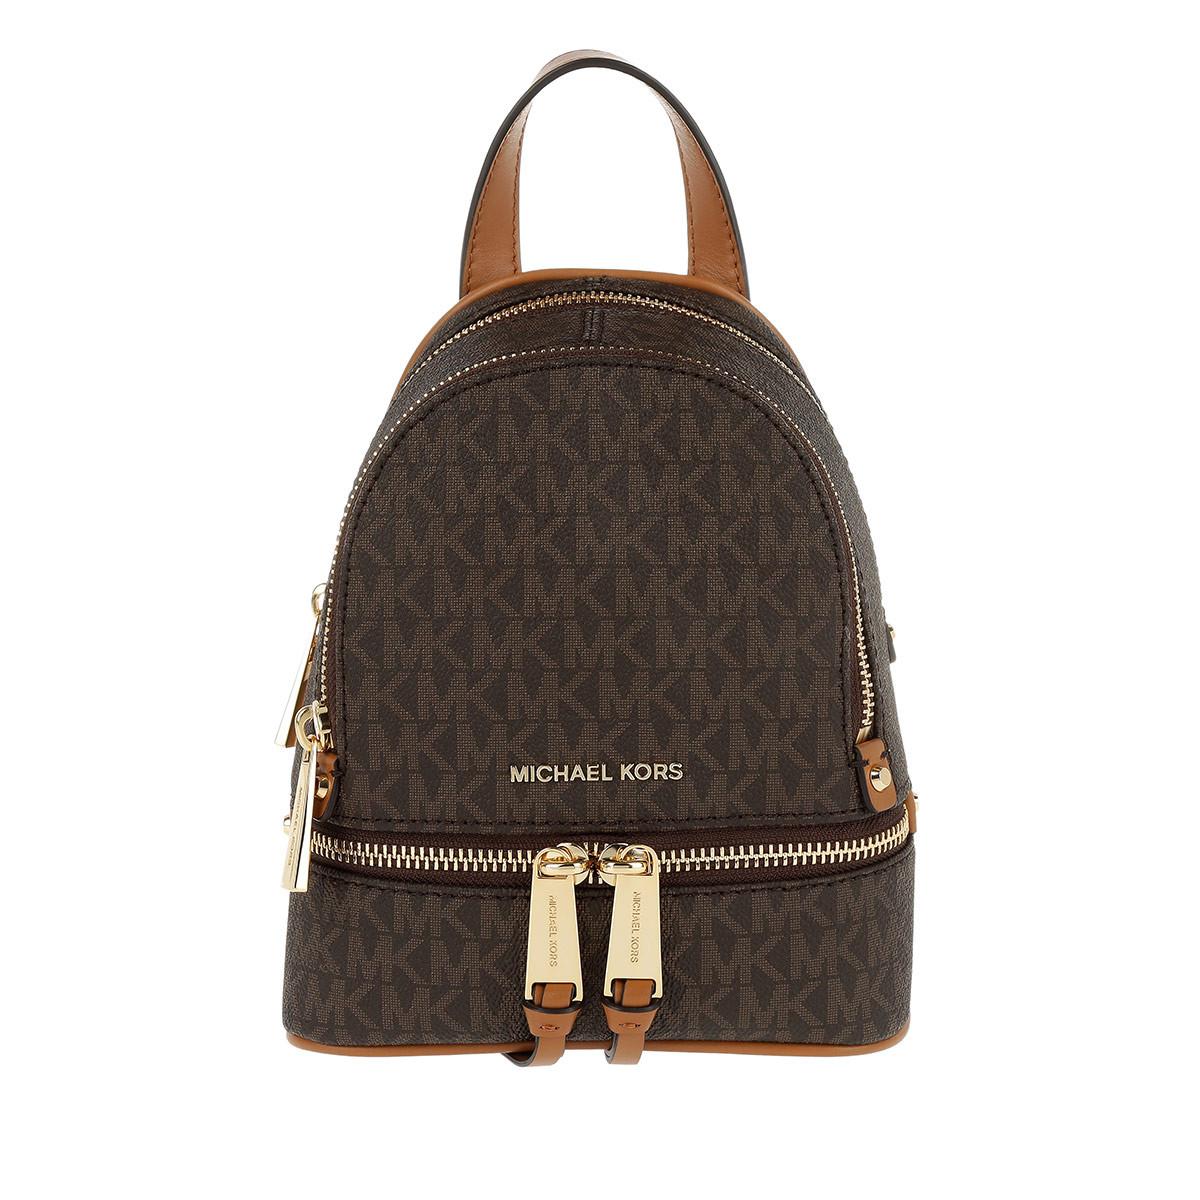 Michael Kors Rucksack - Rhea Zip Messenger Backpack Brown - in braun - für Damen